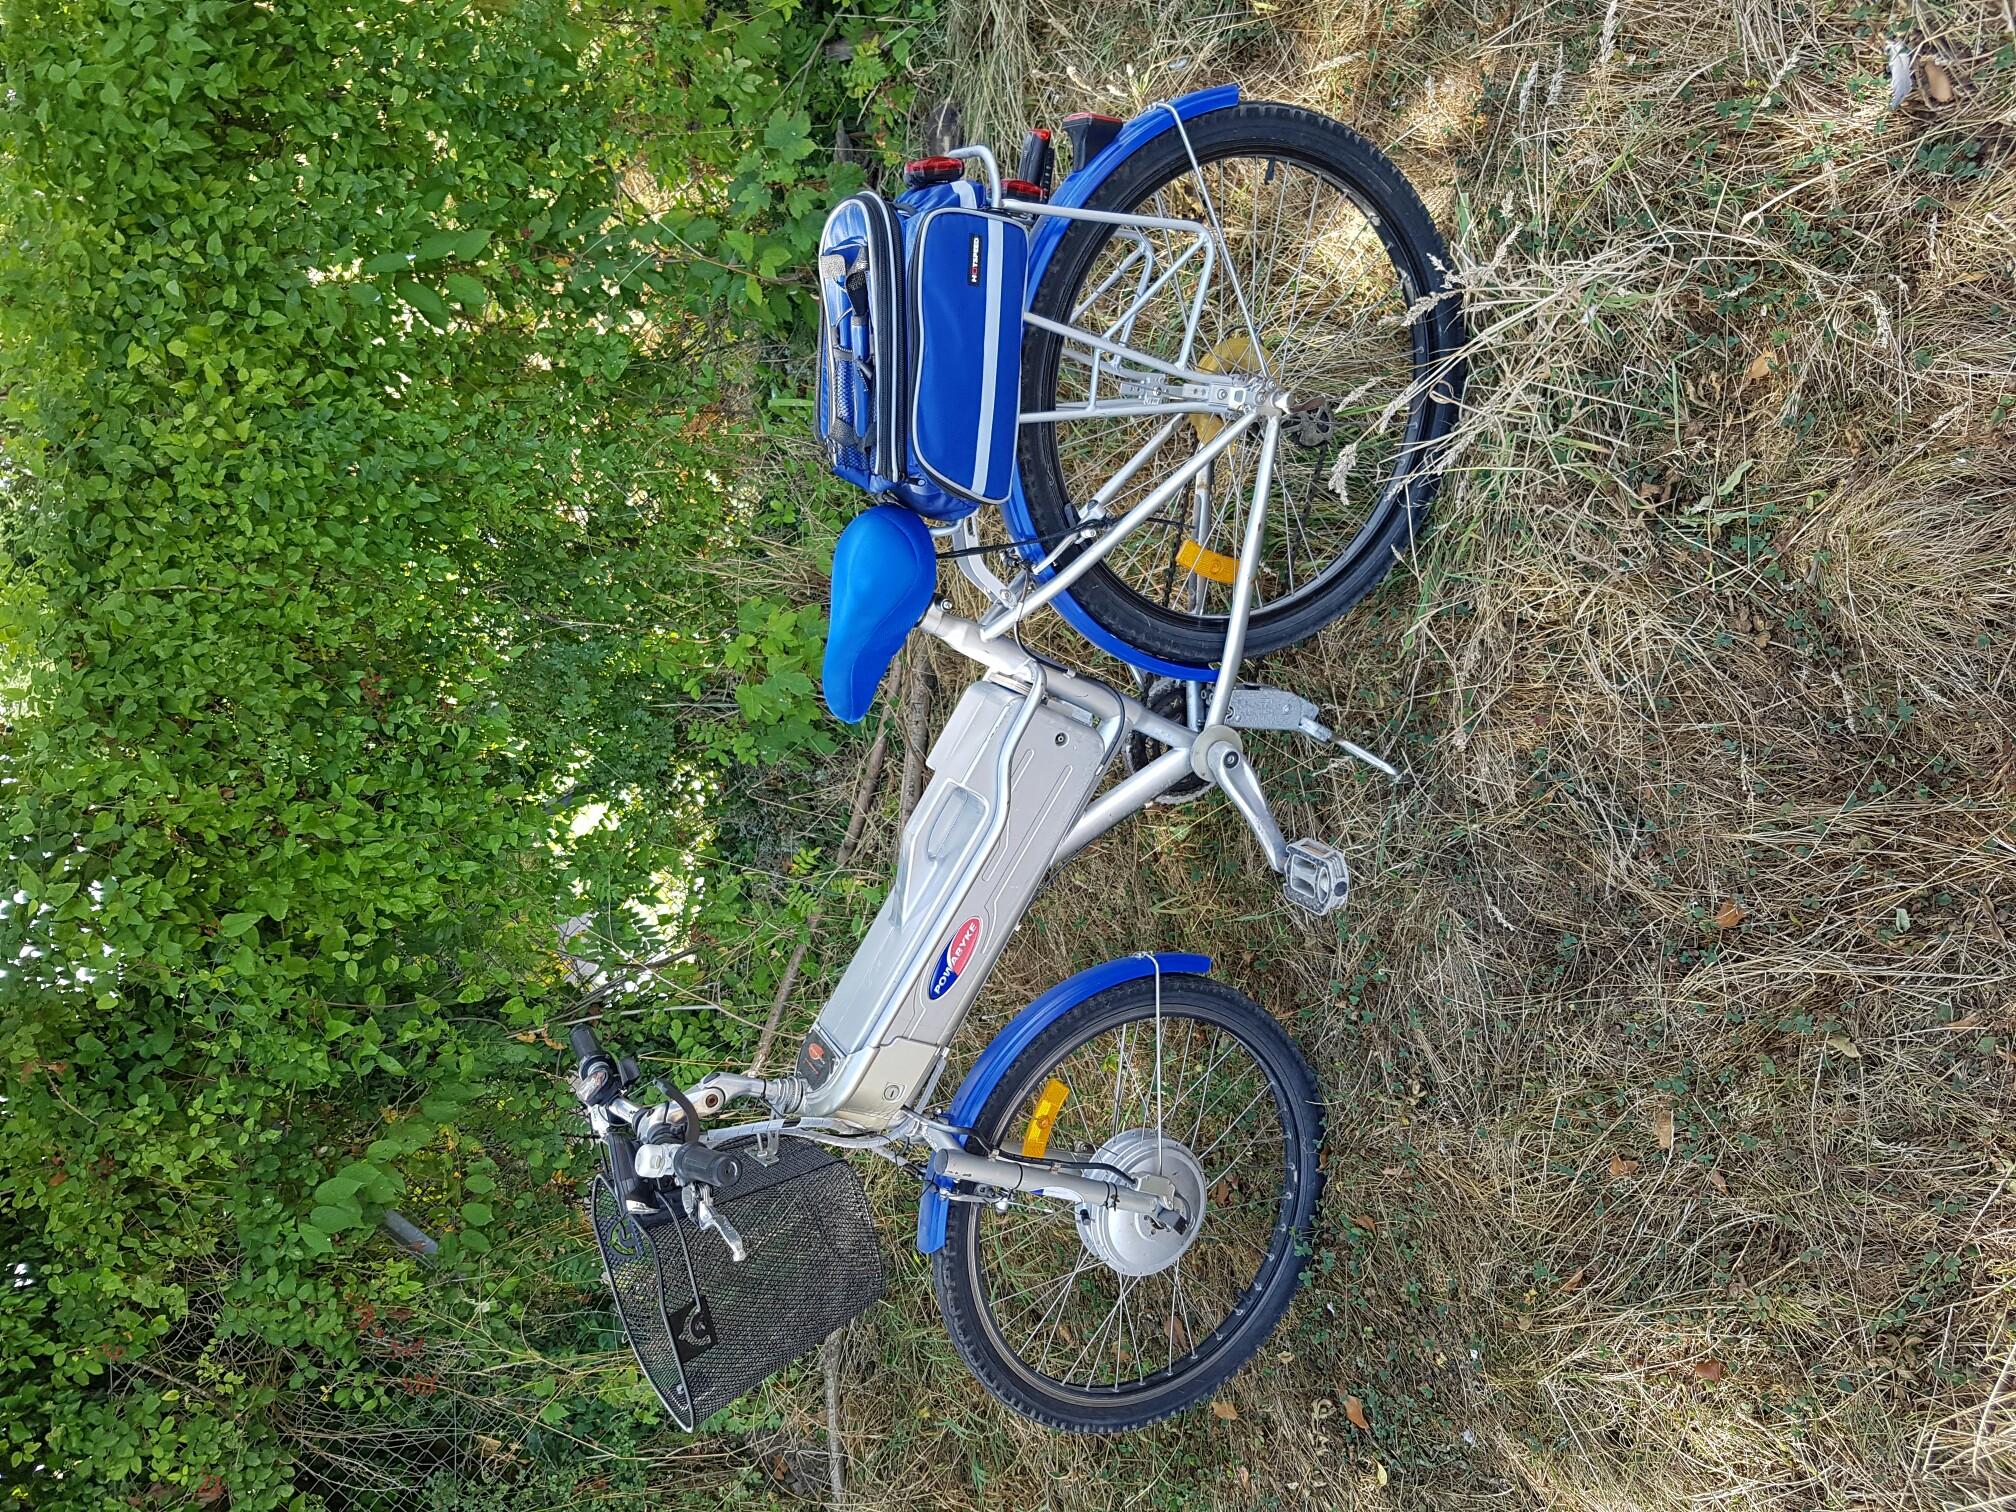 Powabyke Electric Bikes For Sale In Uk View 39 Bargains